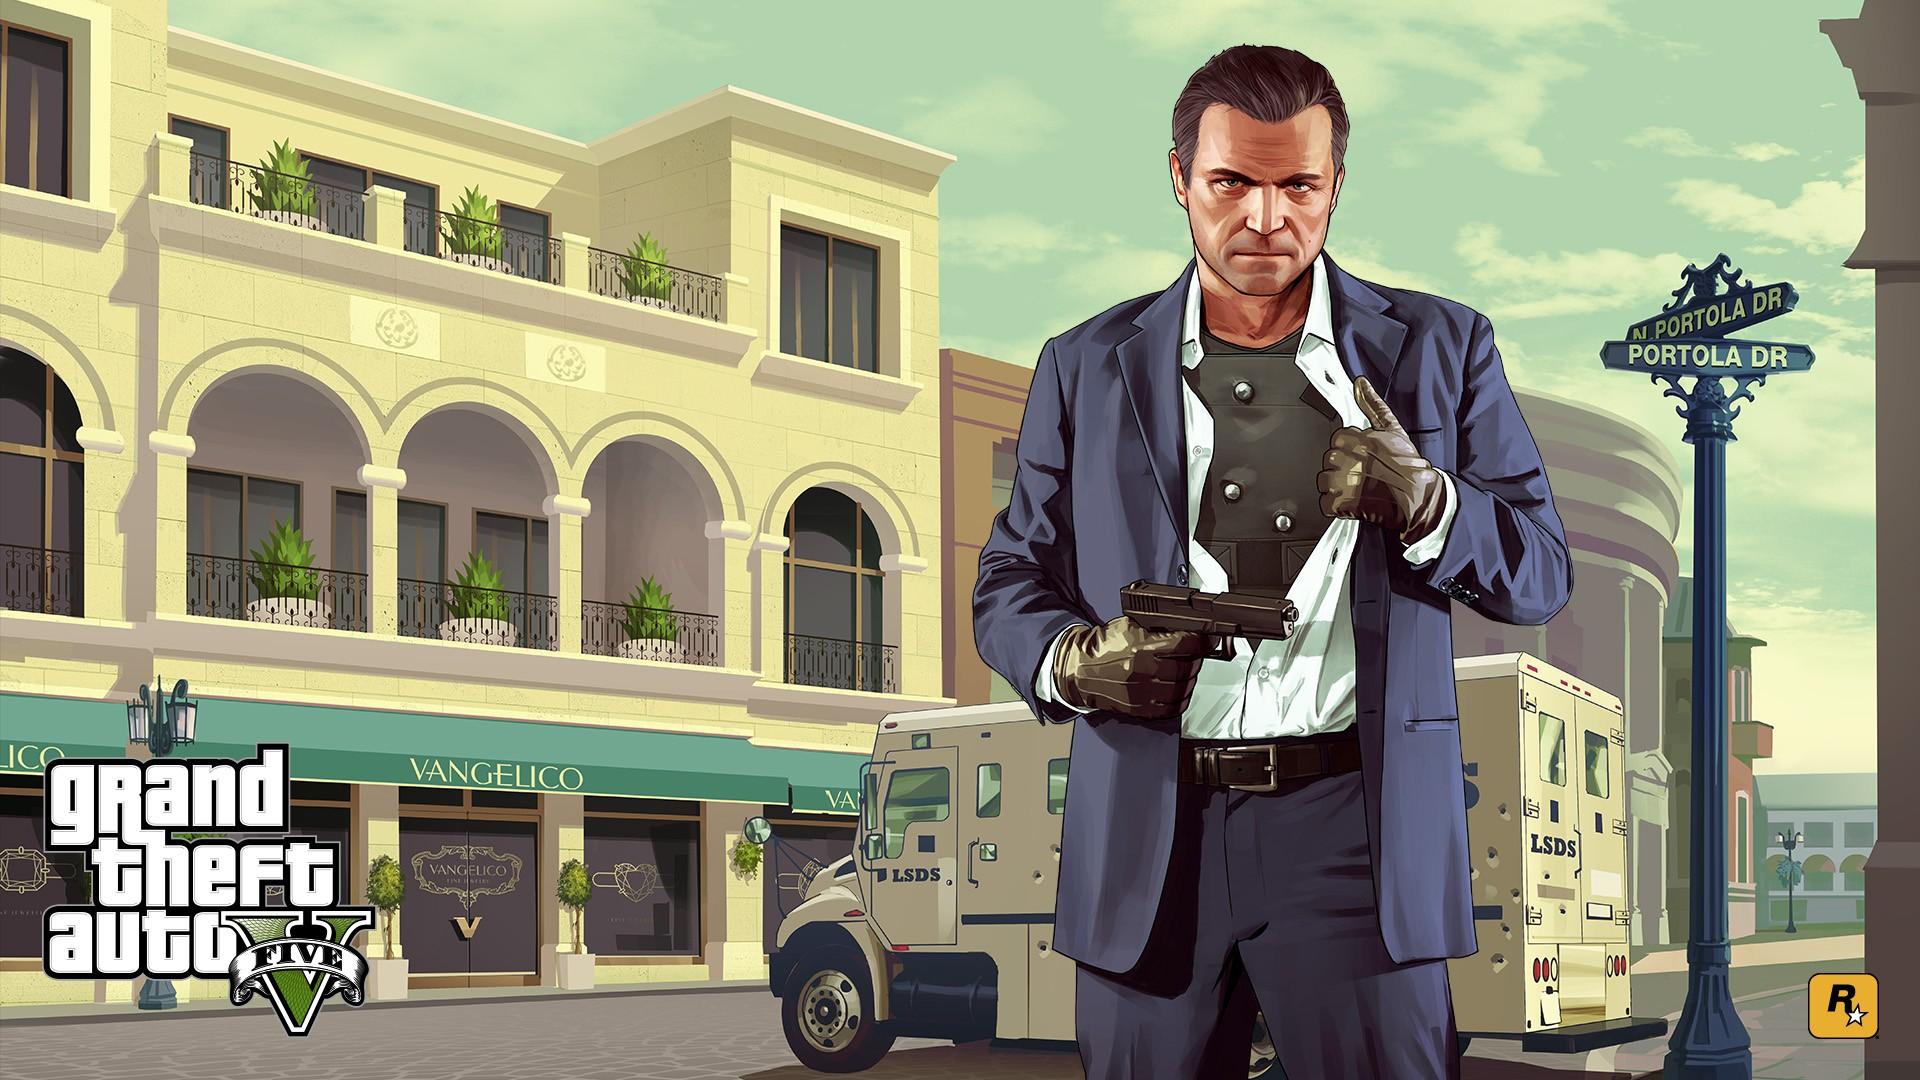 Fondos De Pantalla Grand Theft Auto V Personajes De